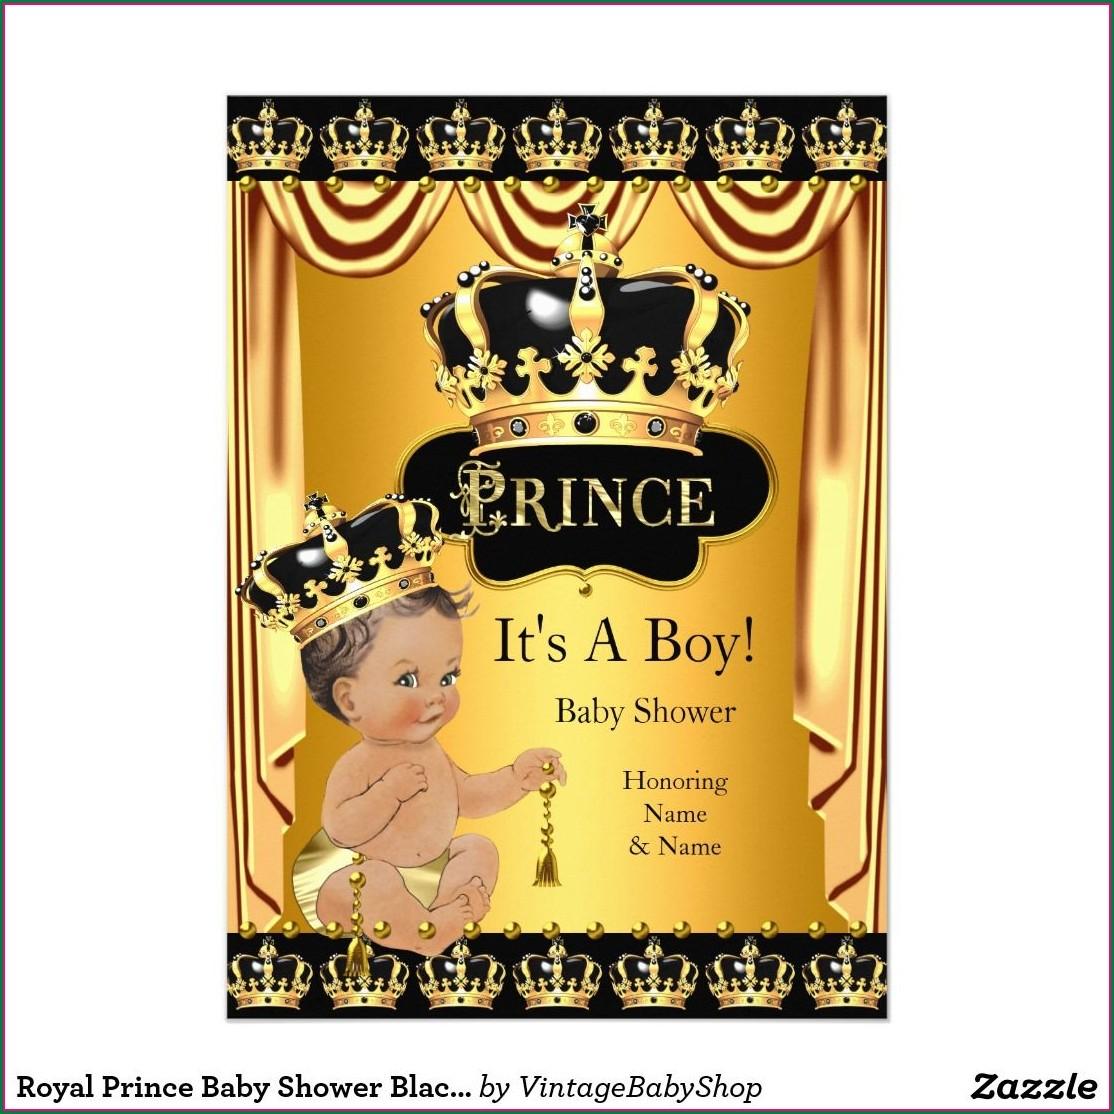 Royal Prince Invitation Background